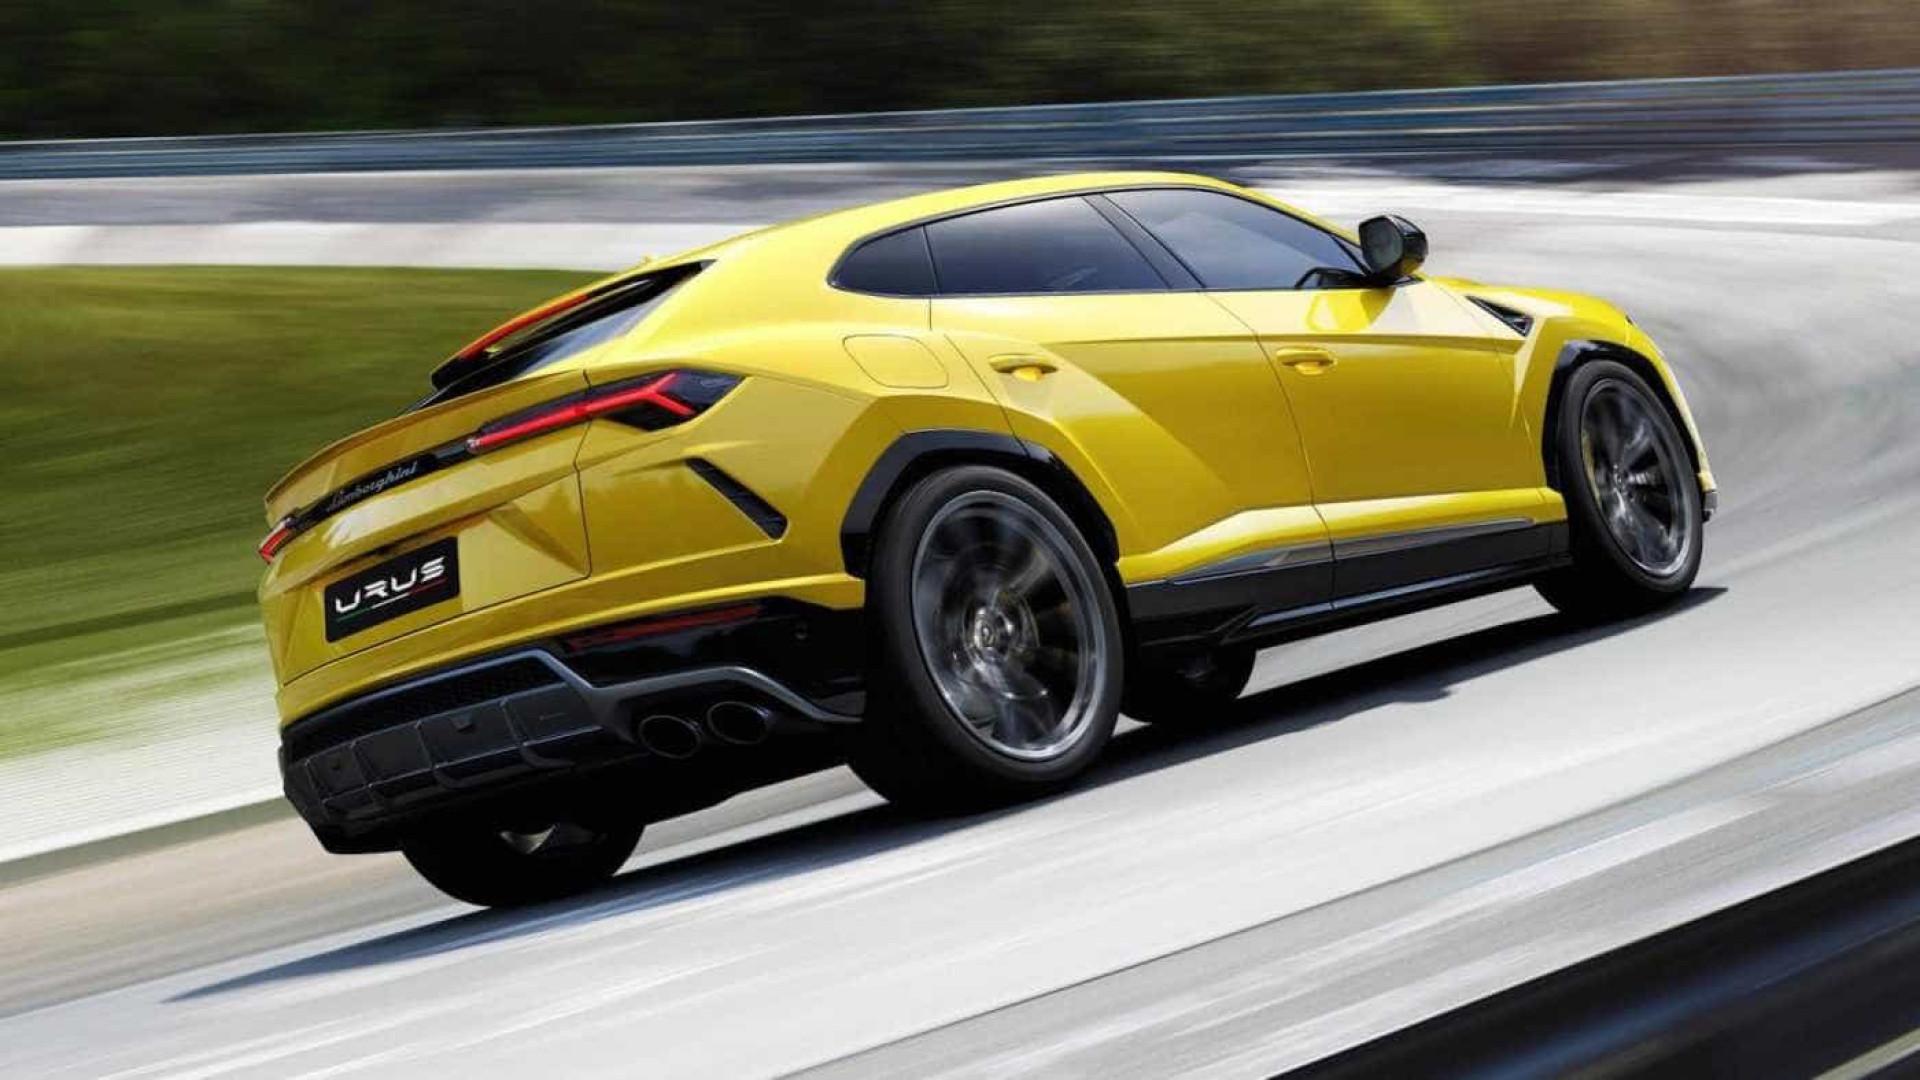 Sabia que pode configurar o Lamborghini Urus em minutos?